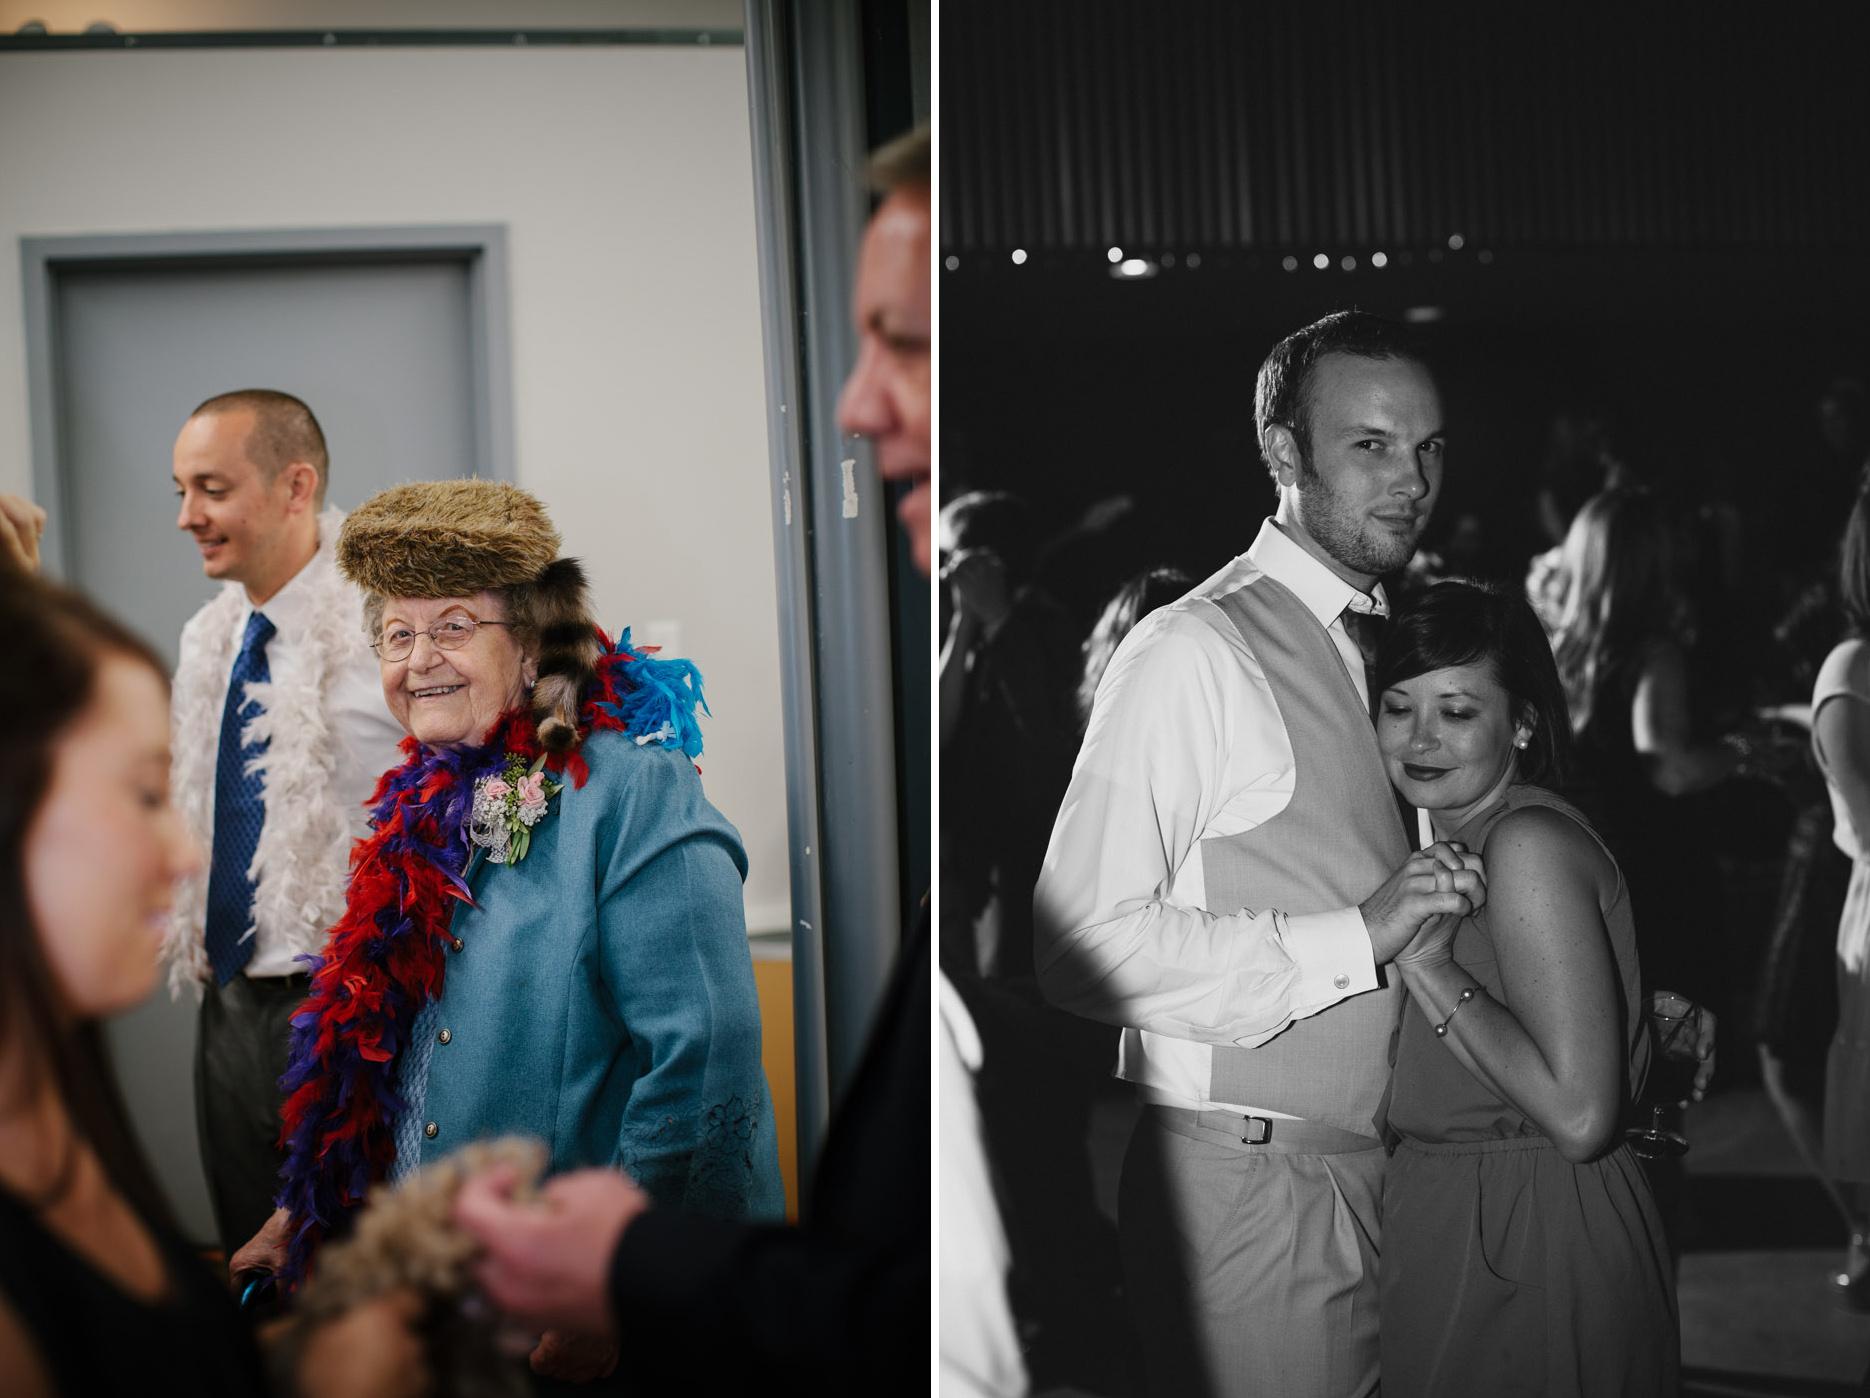 St-Louis-Wedding-Photography-1094-copy.jpg